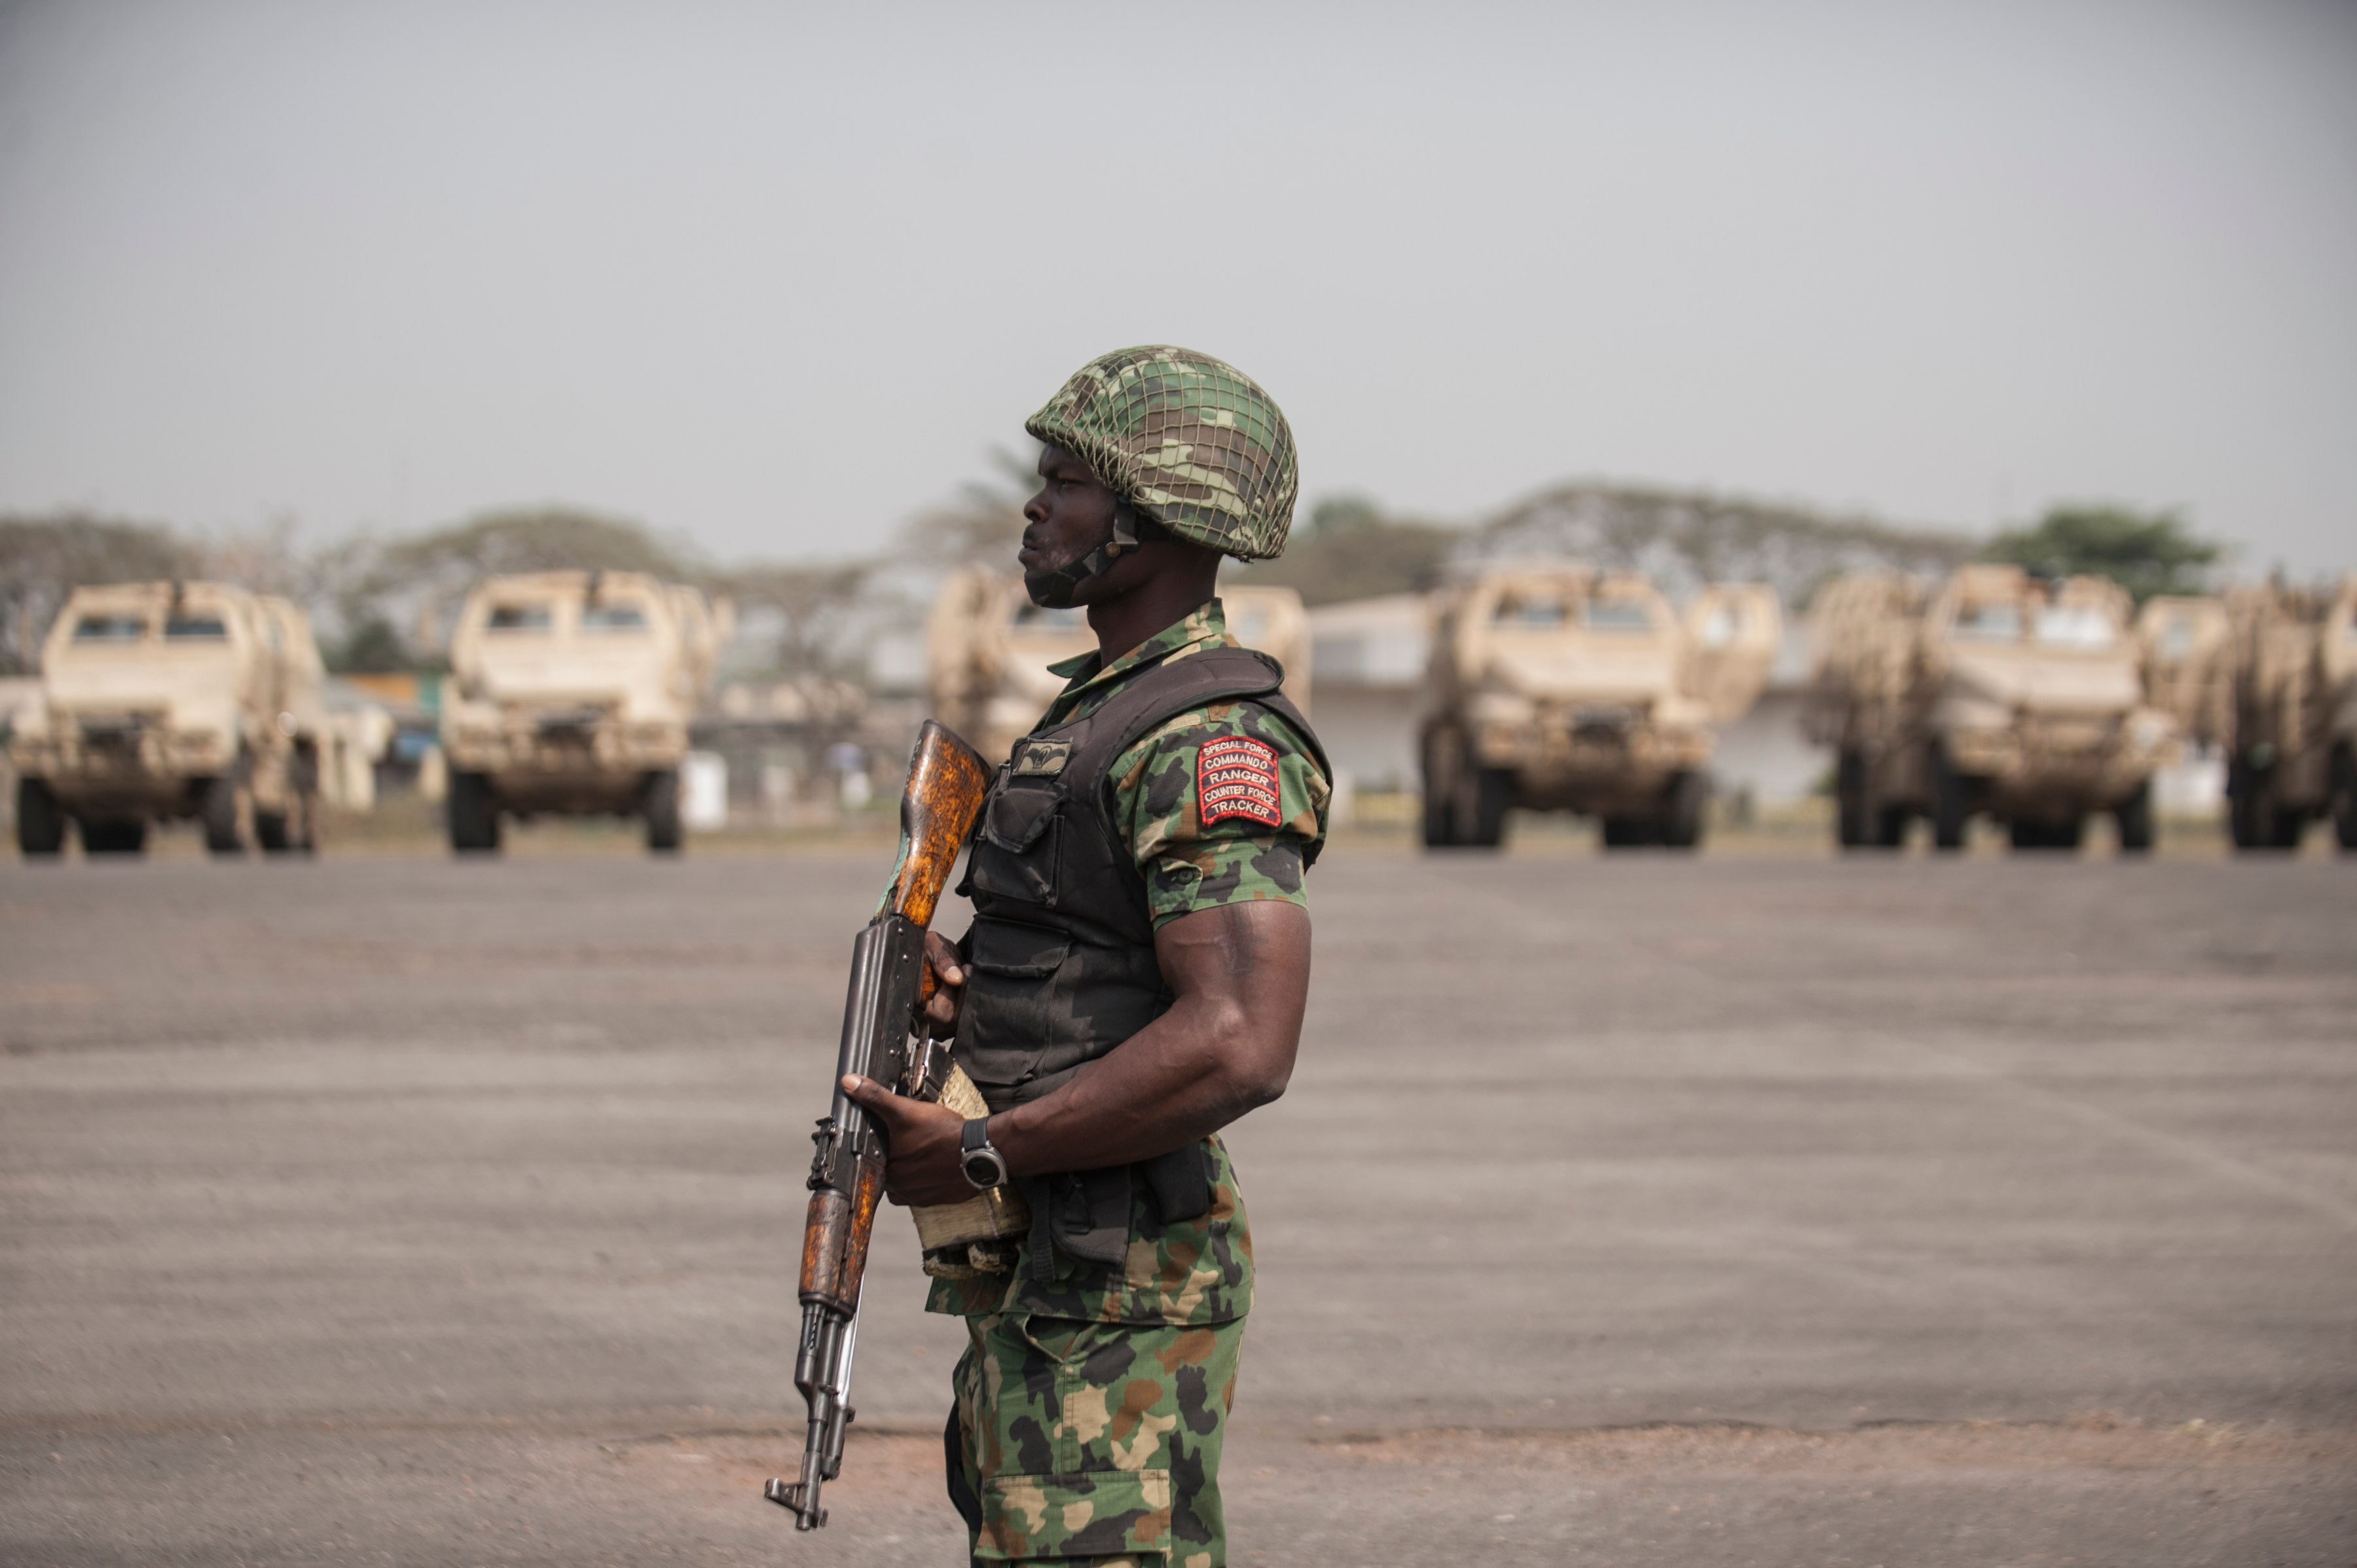 Depot Nigerian Army Military school alerts Nigerians of recruitment